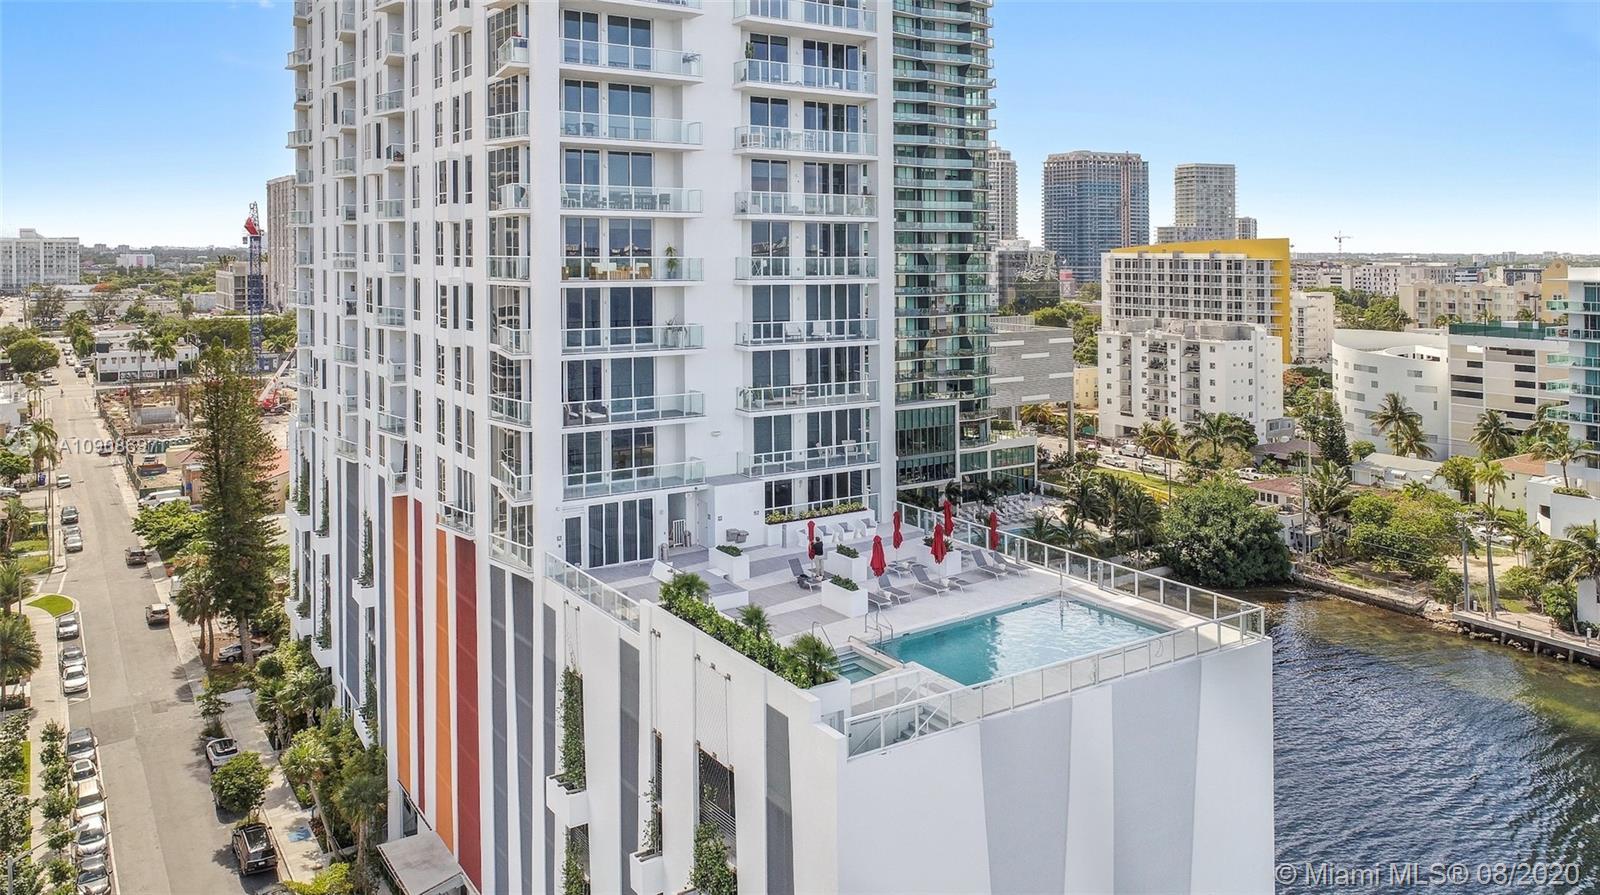 601 NE 27 STREET #1405, Miami FL 33137